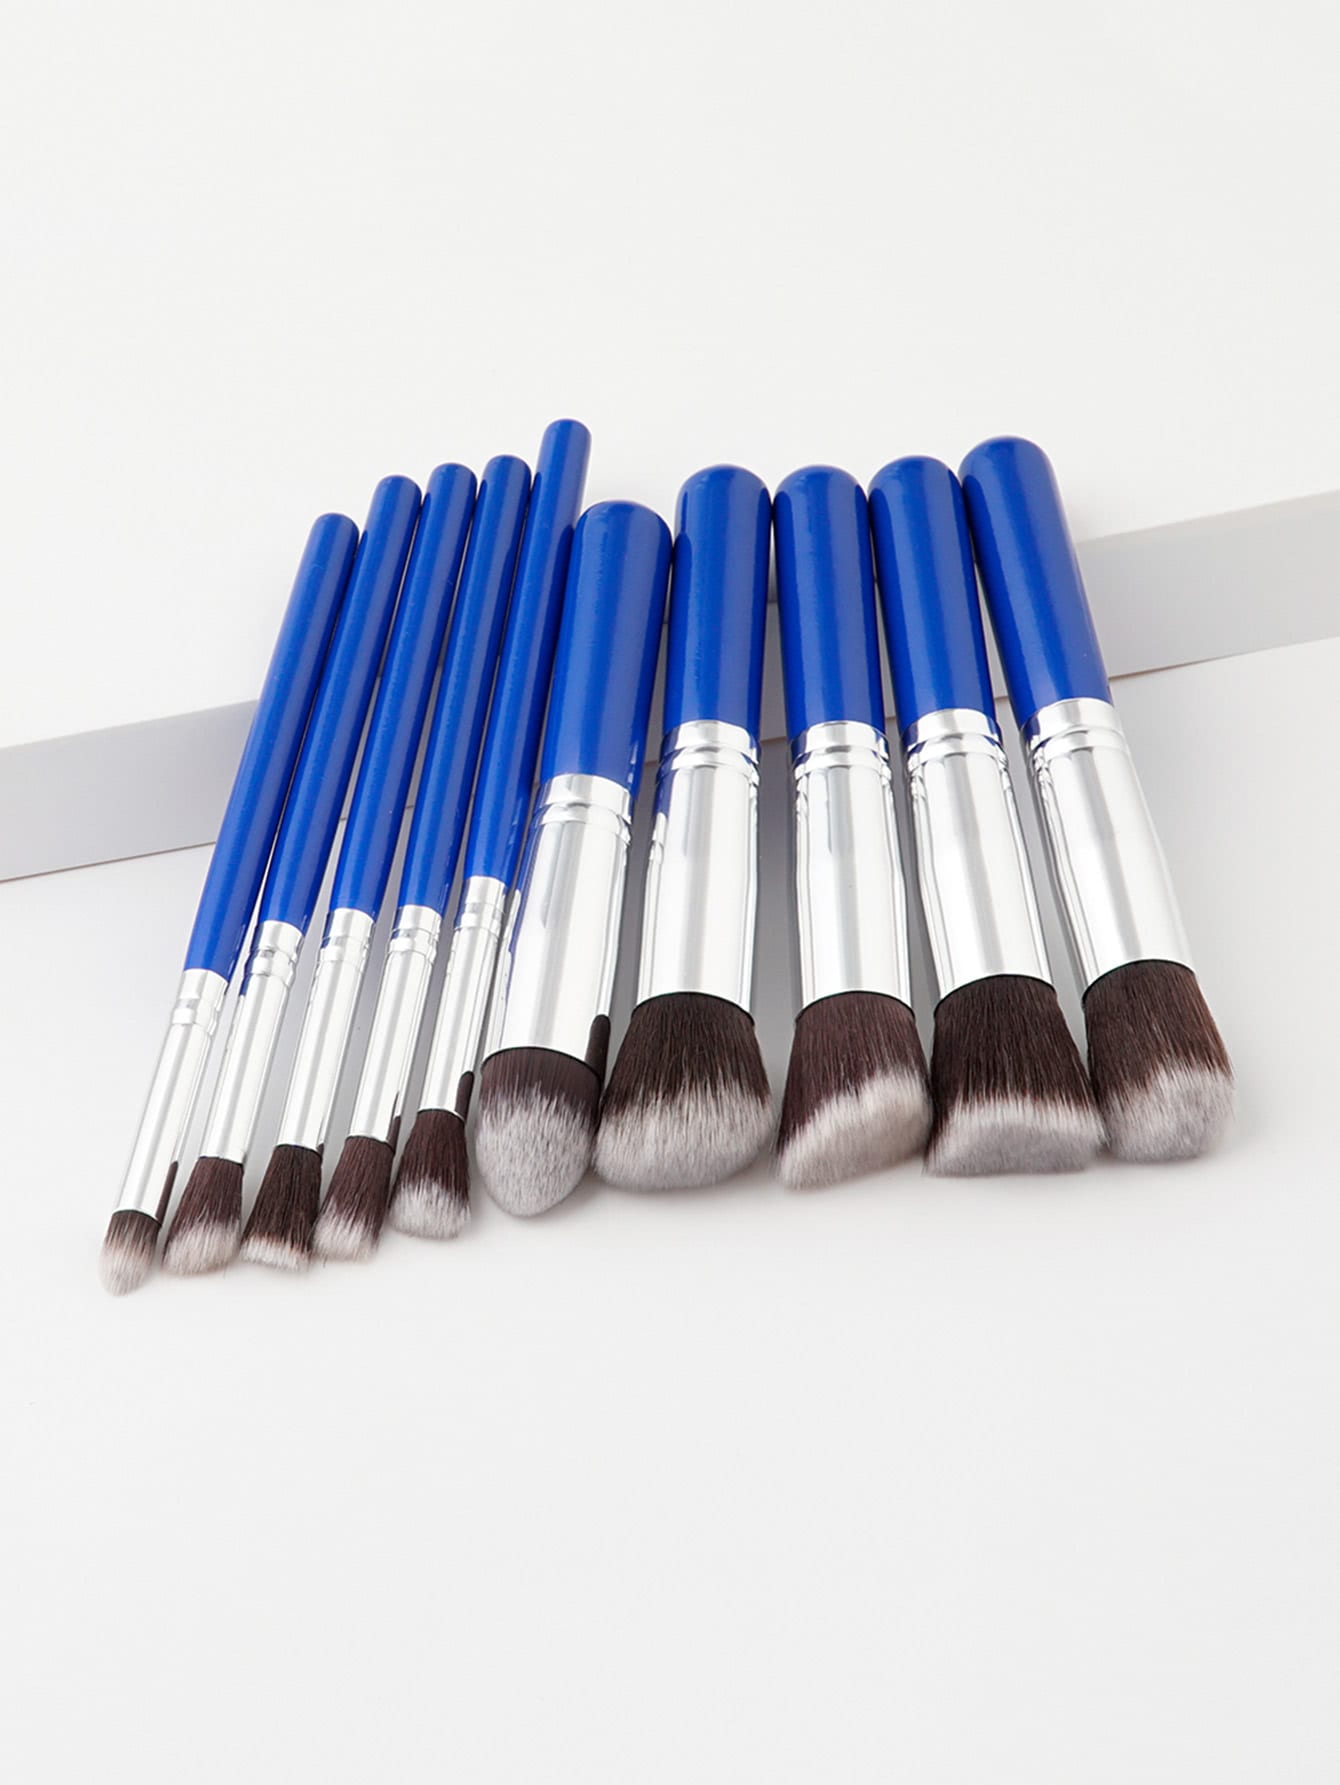 Two Tone Handle Makeup Brush Set 10pcs